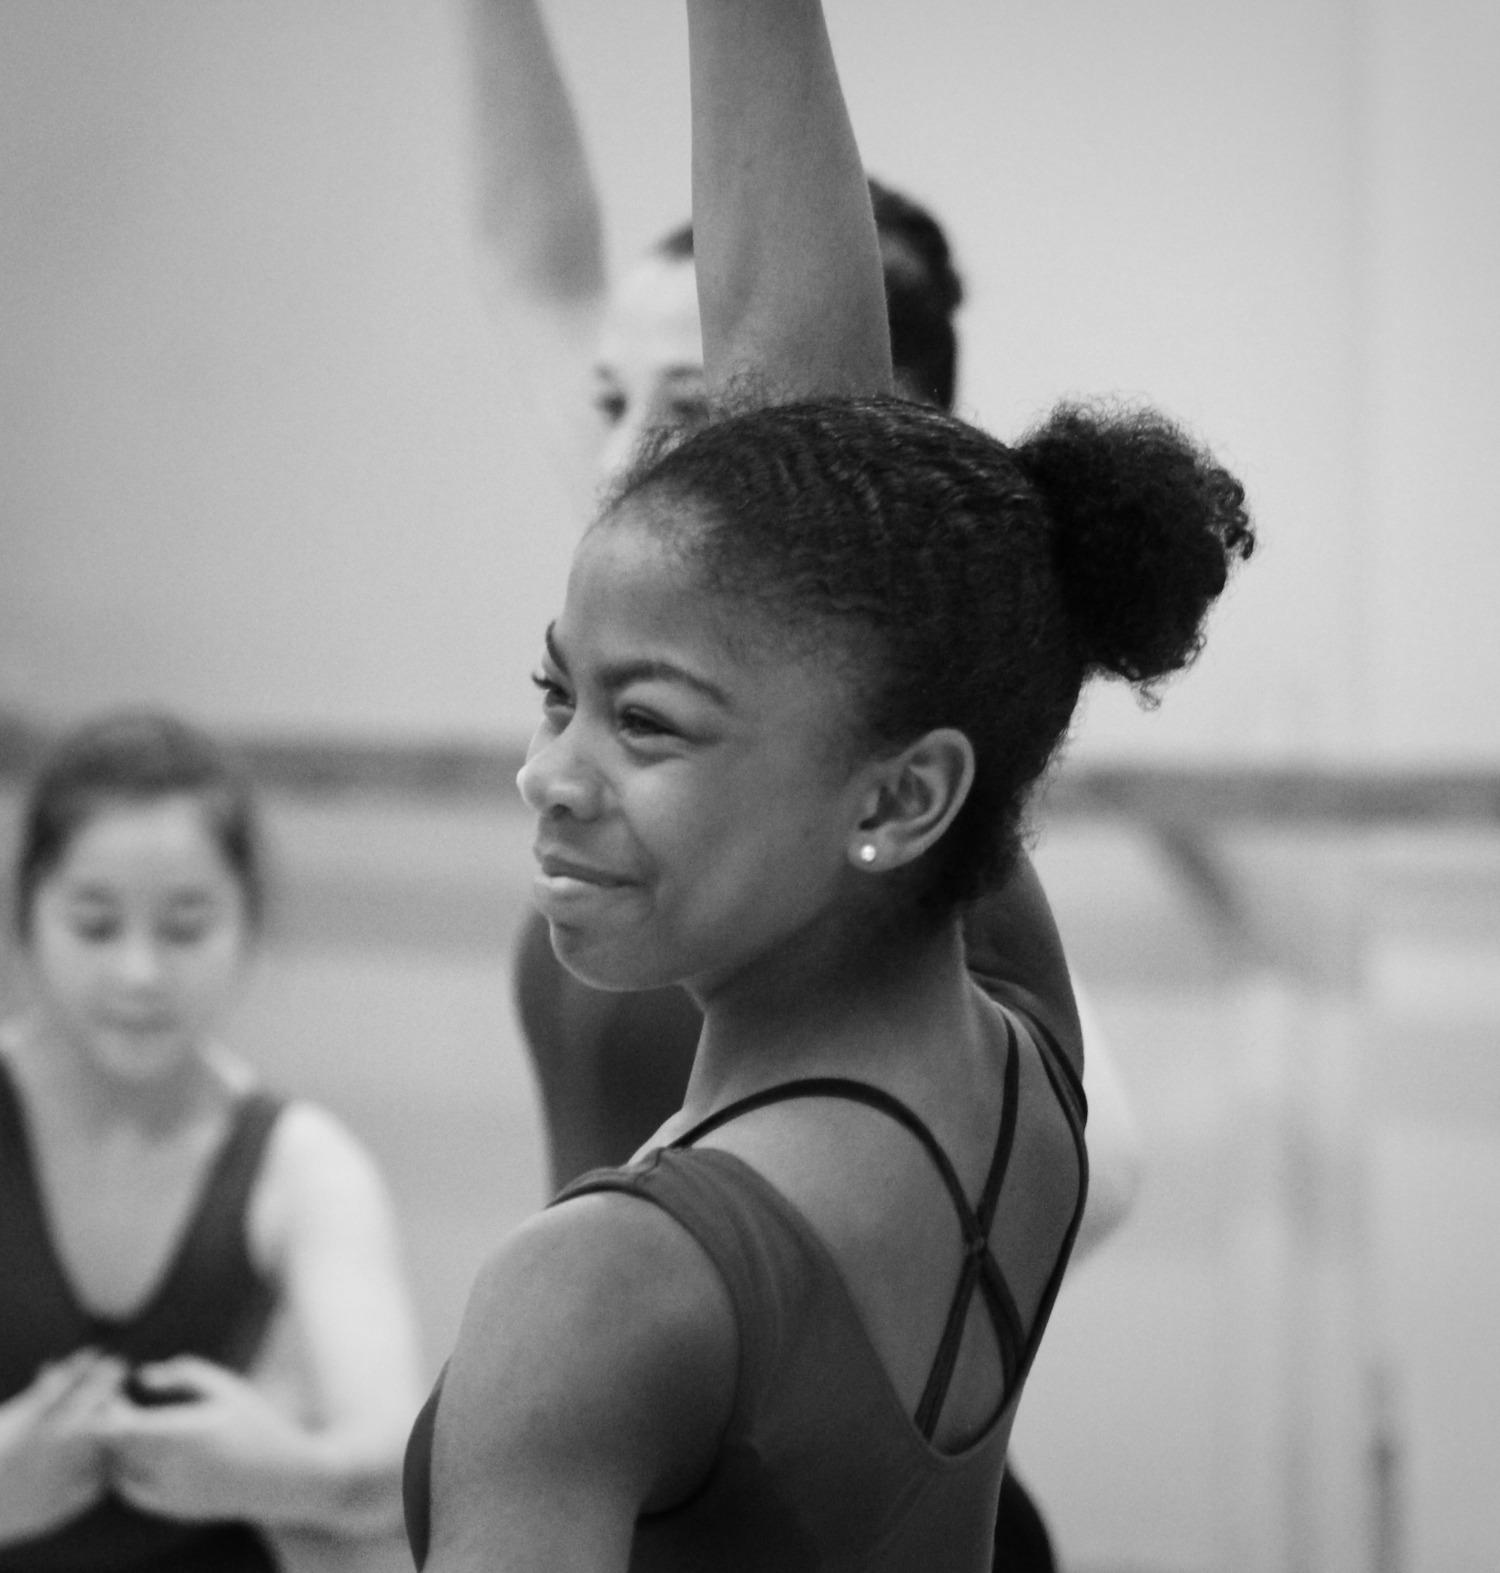 teen-ballet-student.jpg